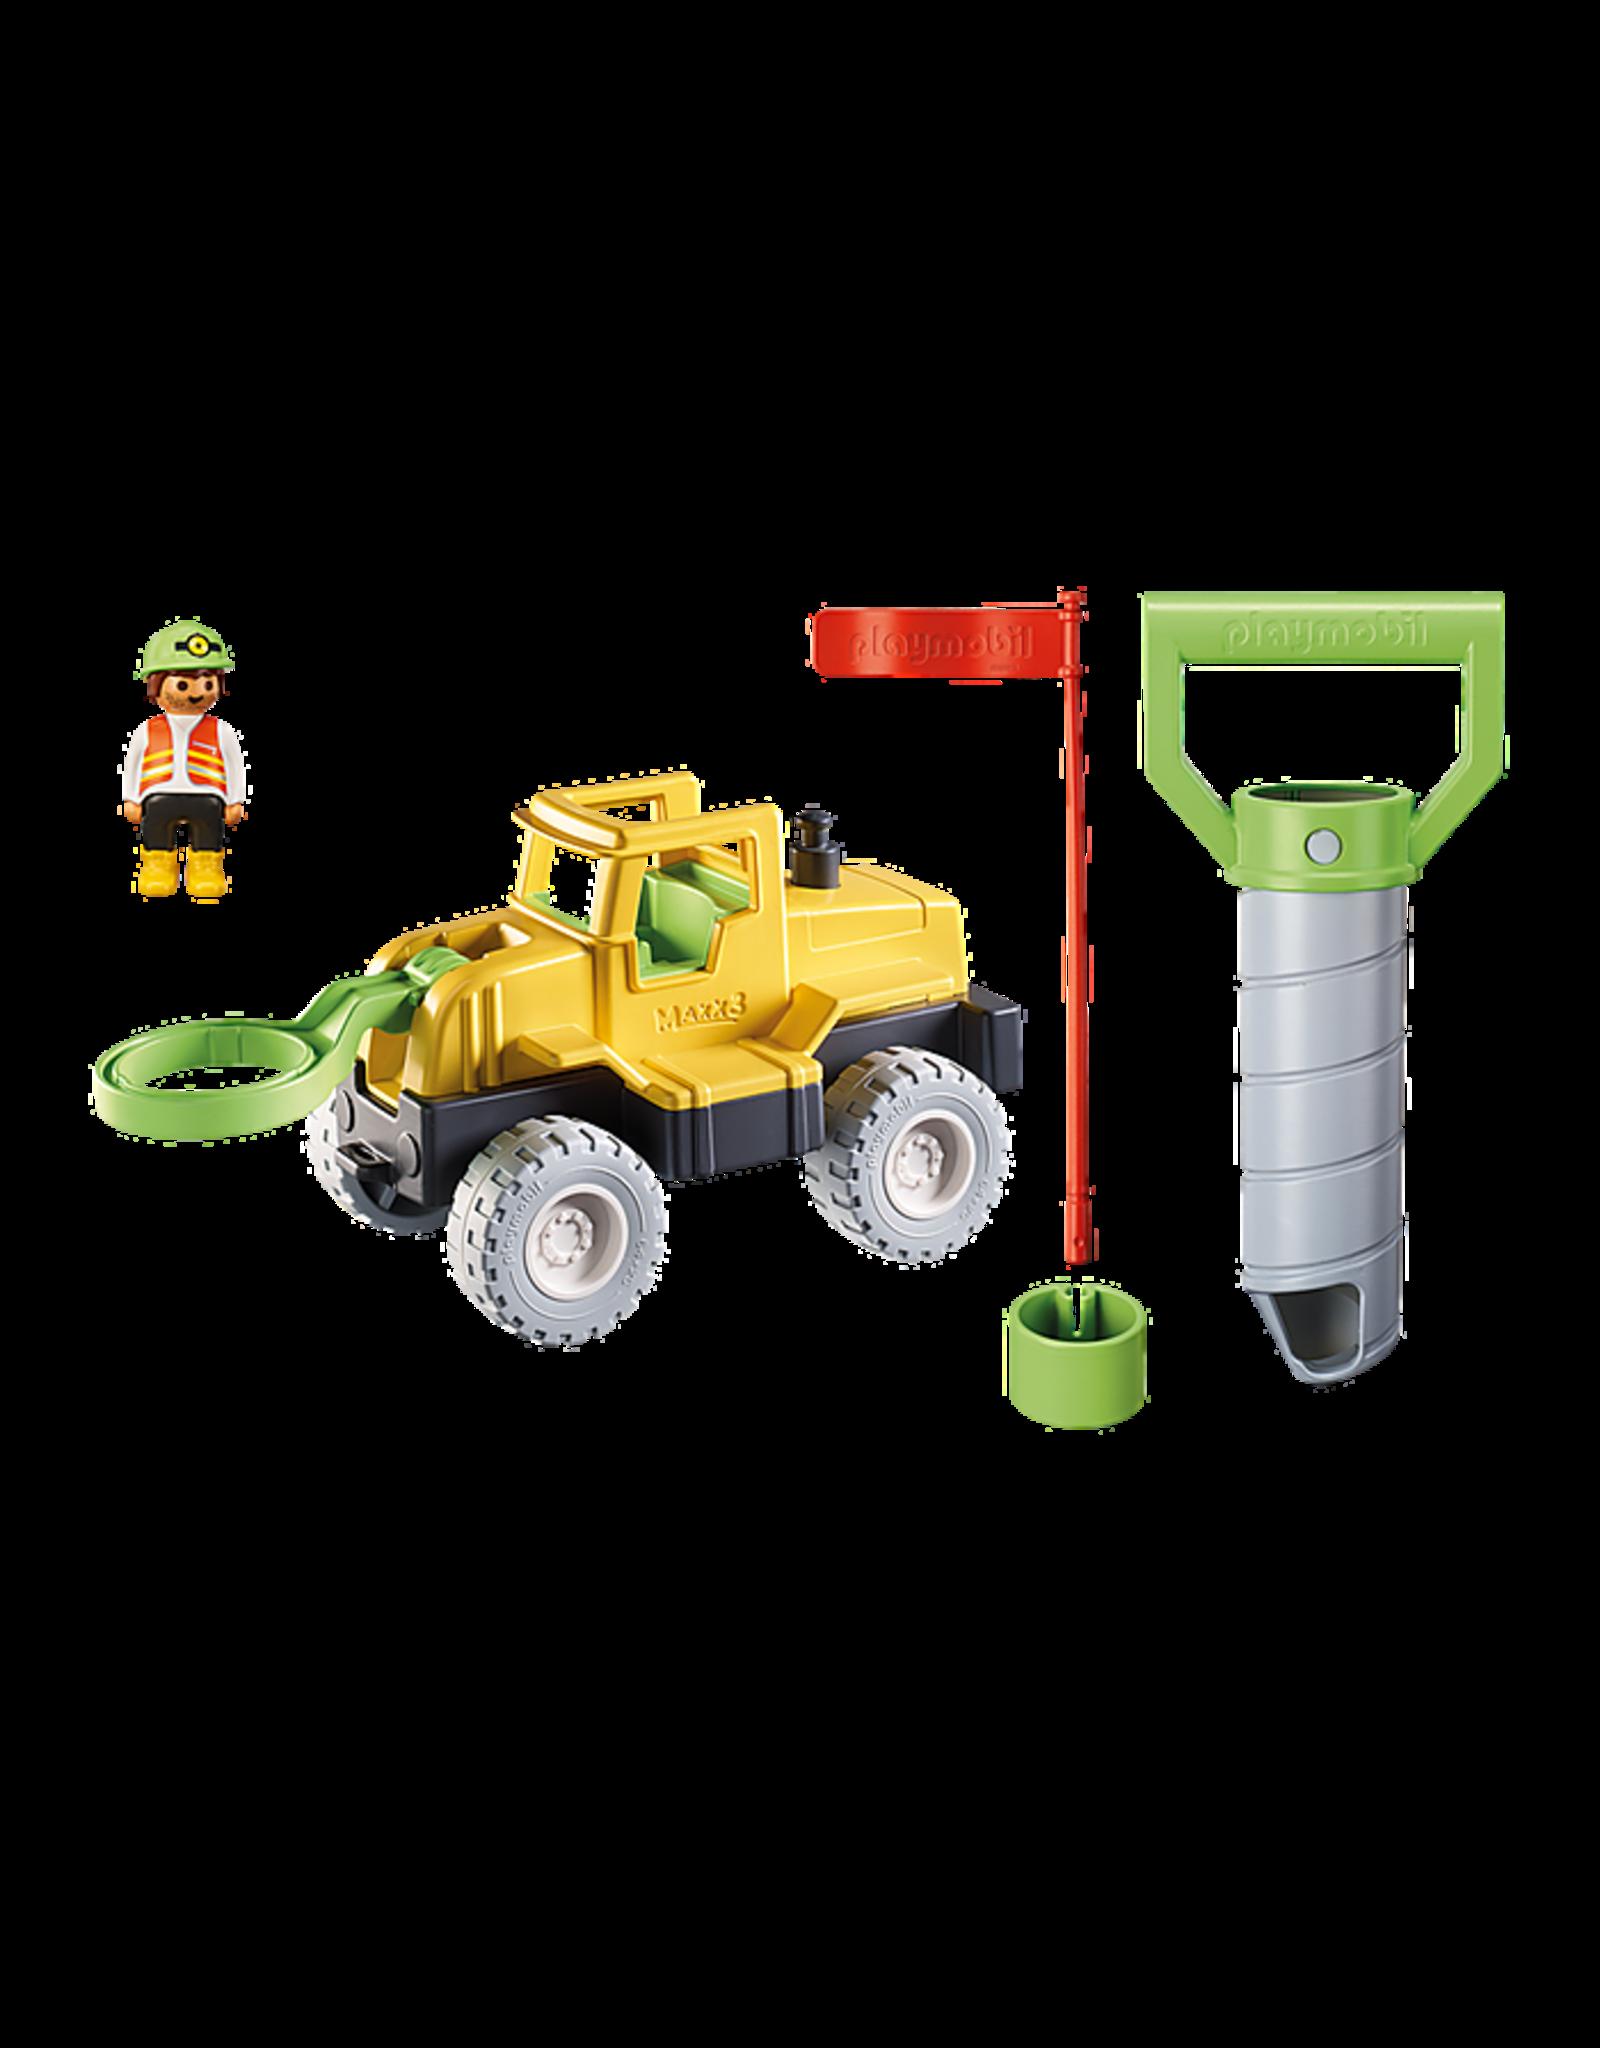 Playmobil Drilling Rig